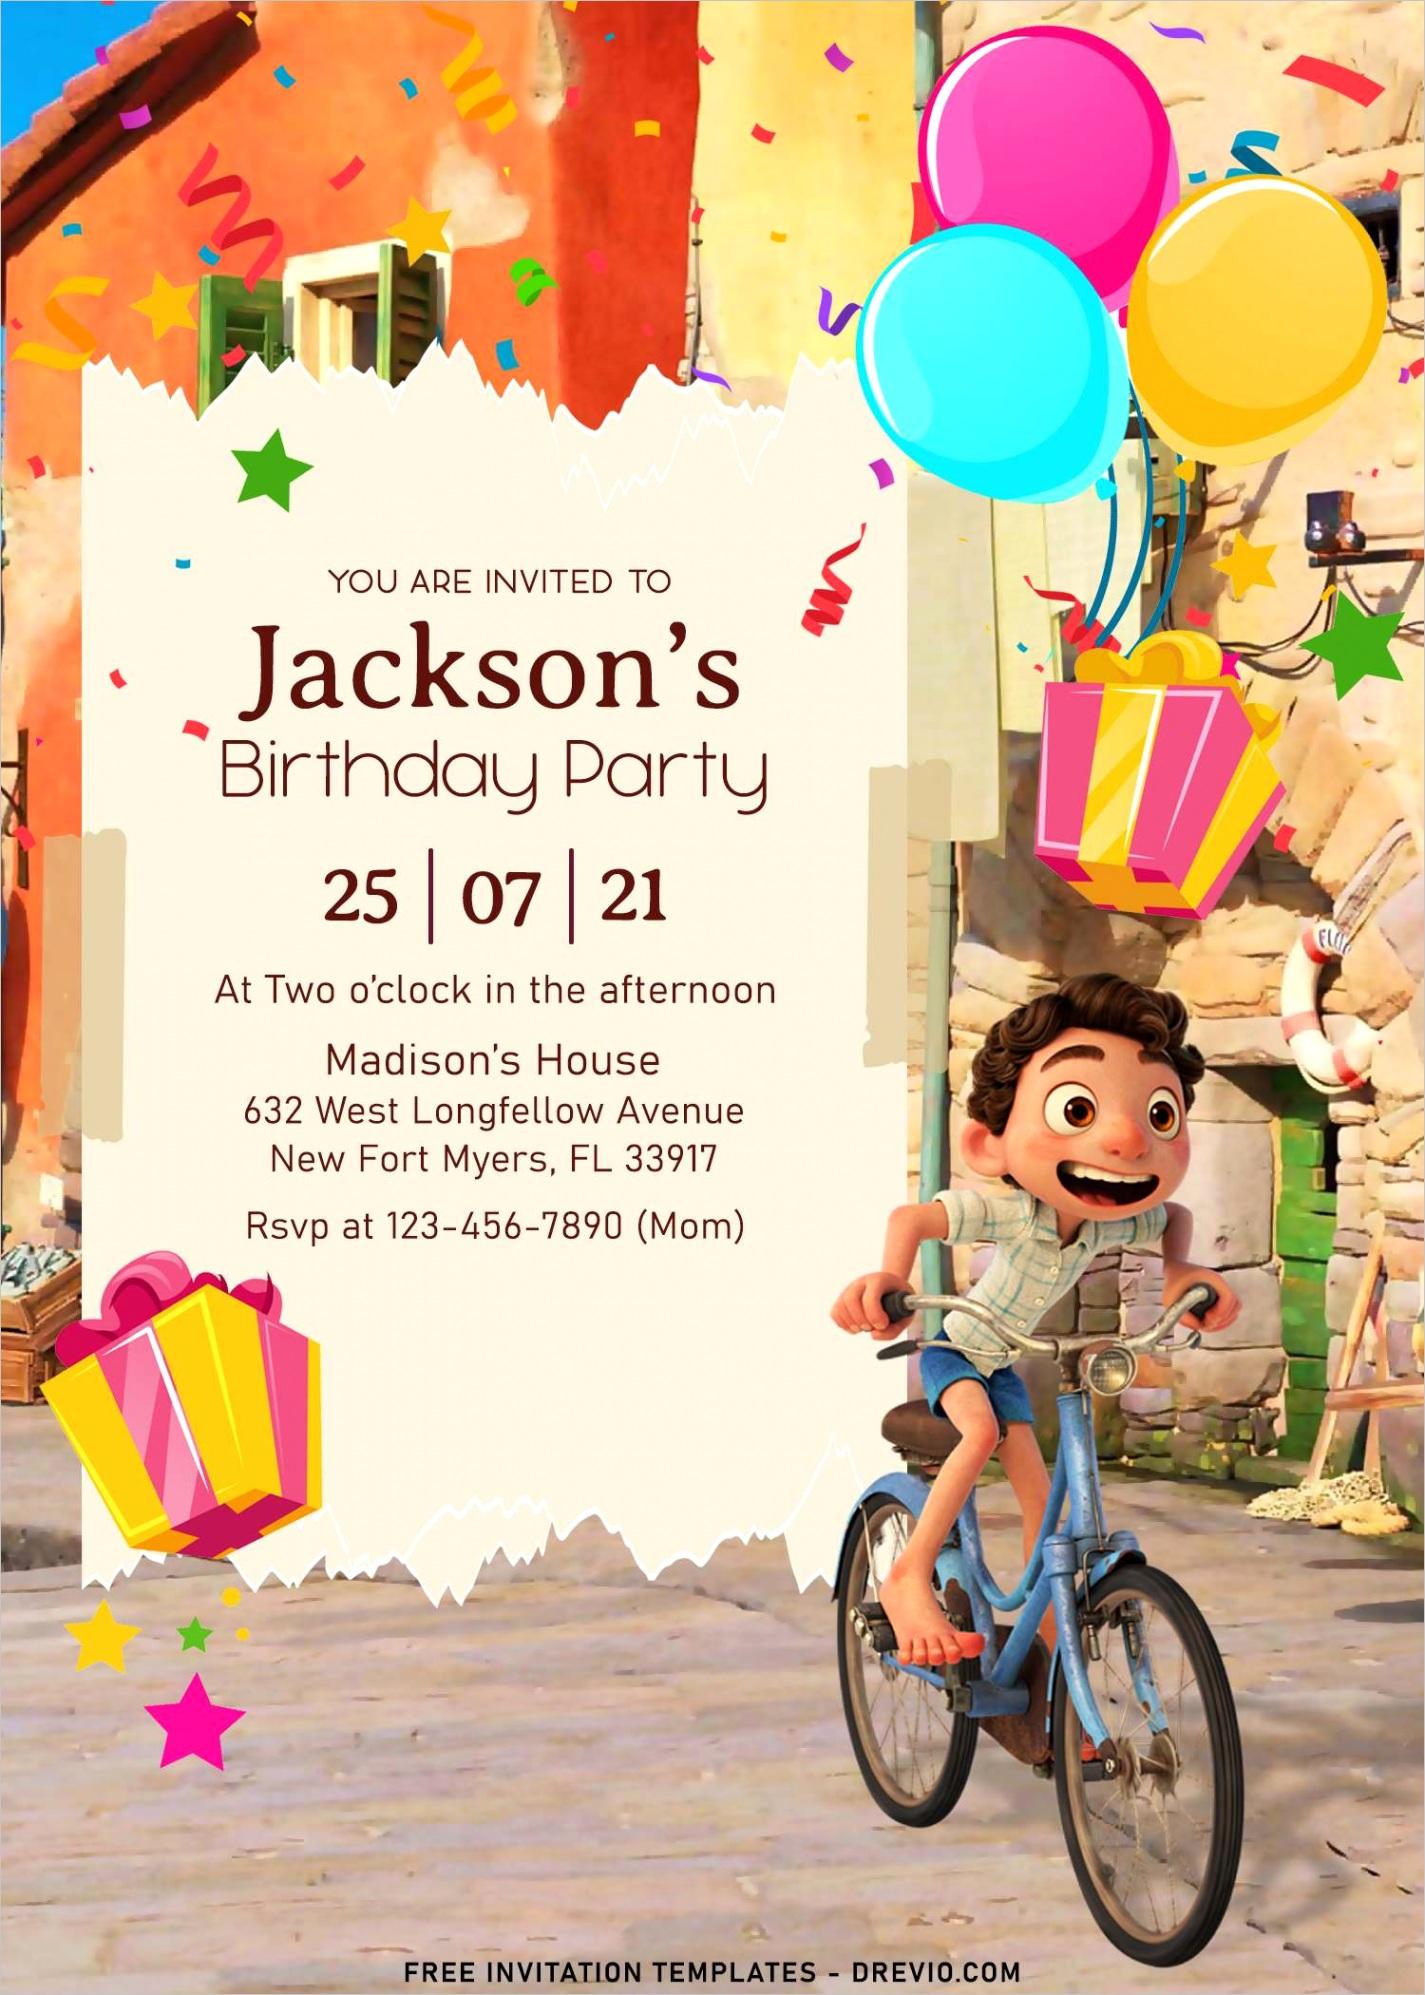 8 disney luca birthday invitation templates for your kid birthday party